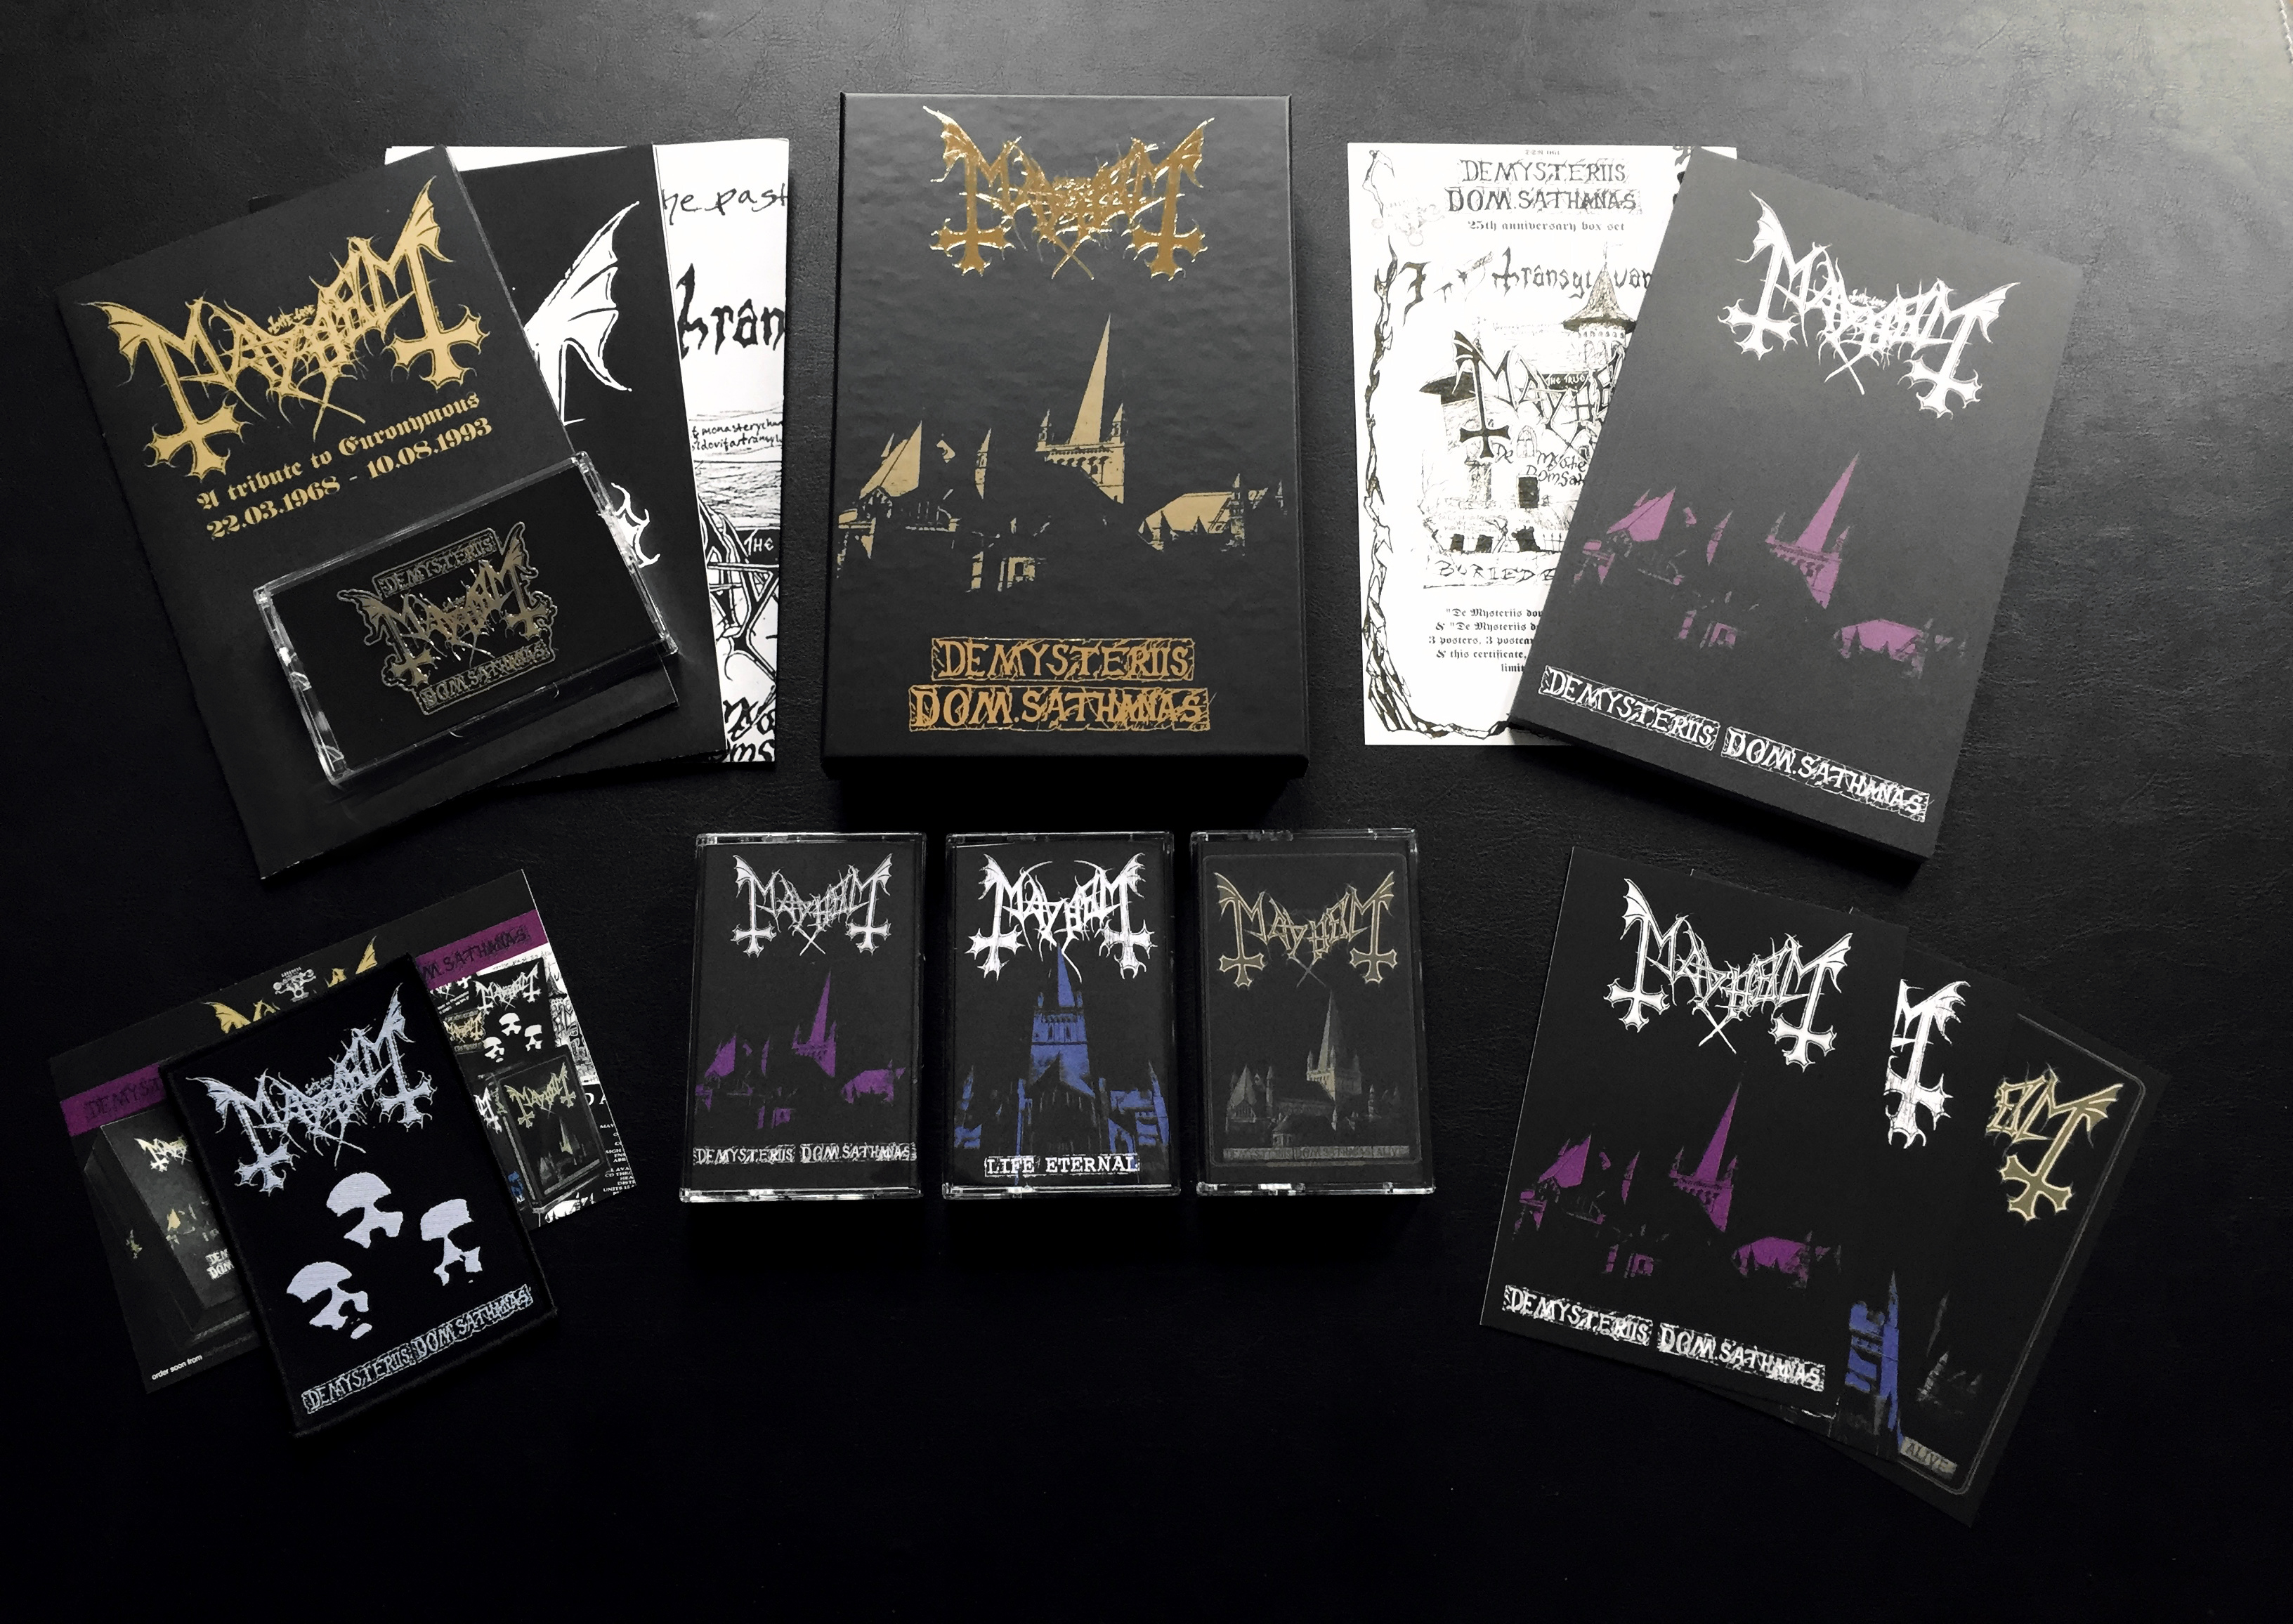 Mayhem Nor De Mysteriis Dom Sathanas 3 Tape Box Darkness Shall Rise Productions